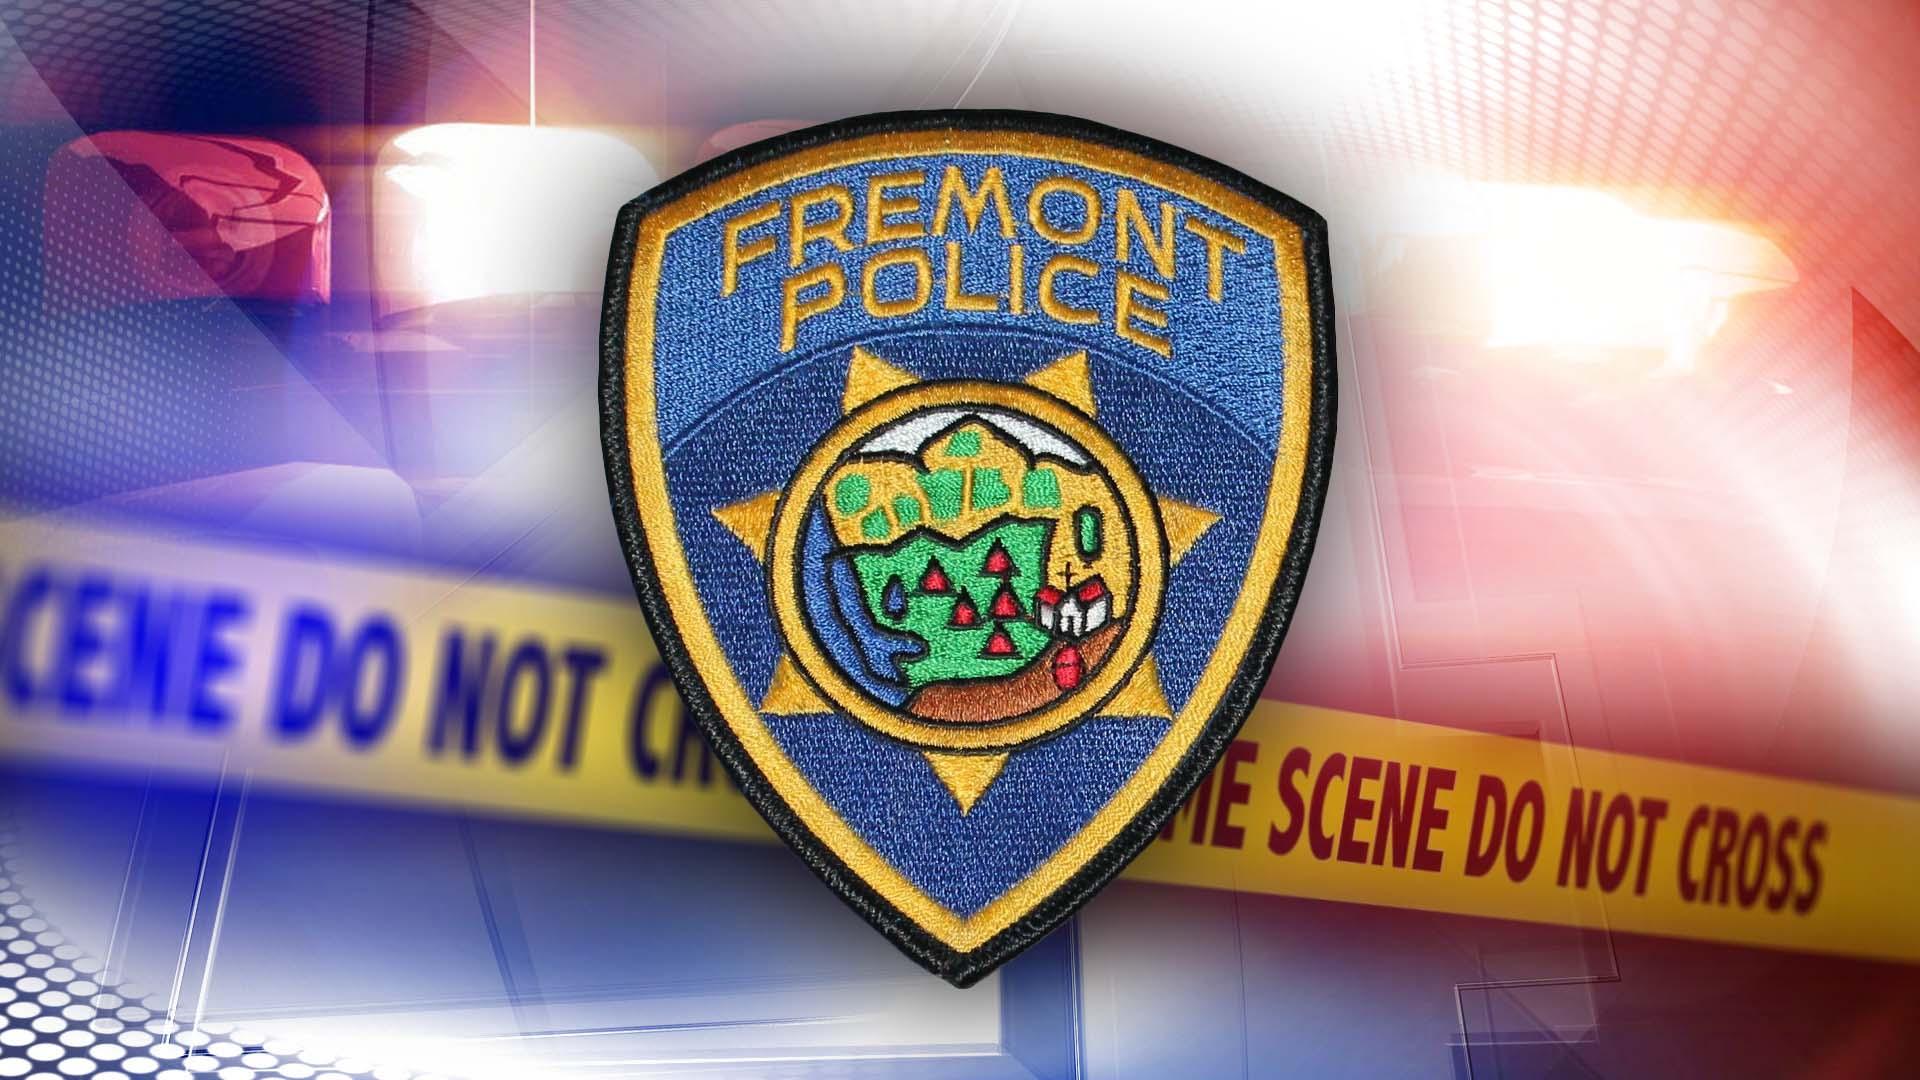 graphic FS Police Fremont police_1523150826539.jpg.jpg